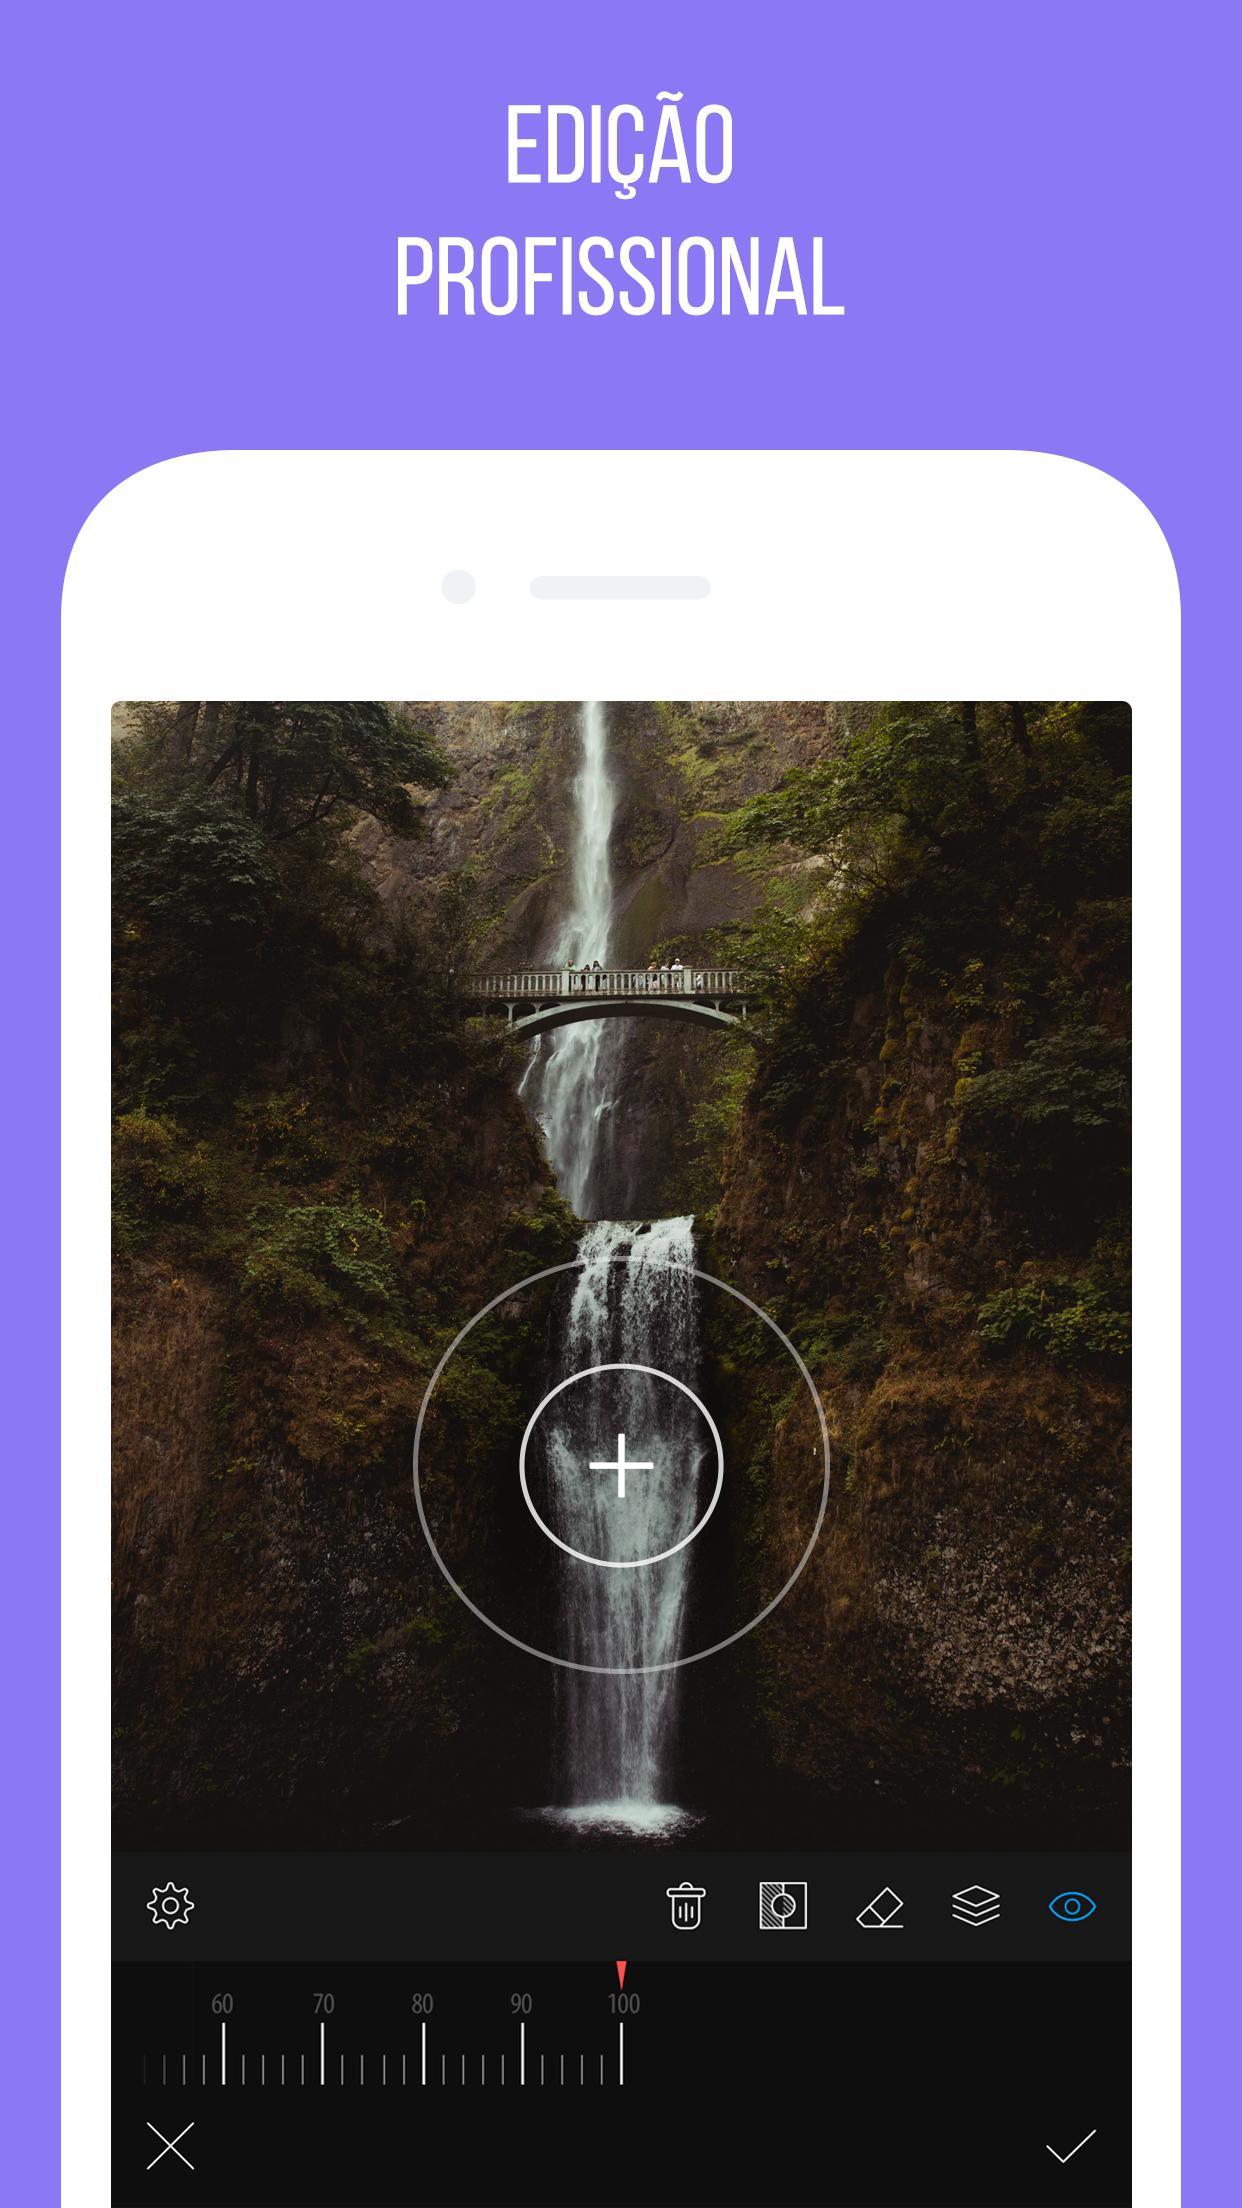 ferramenta de foco no aplicativo de fotosCamly